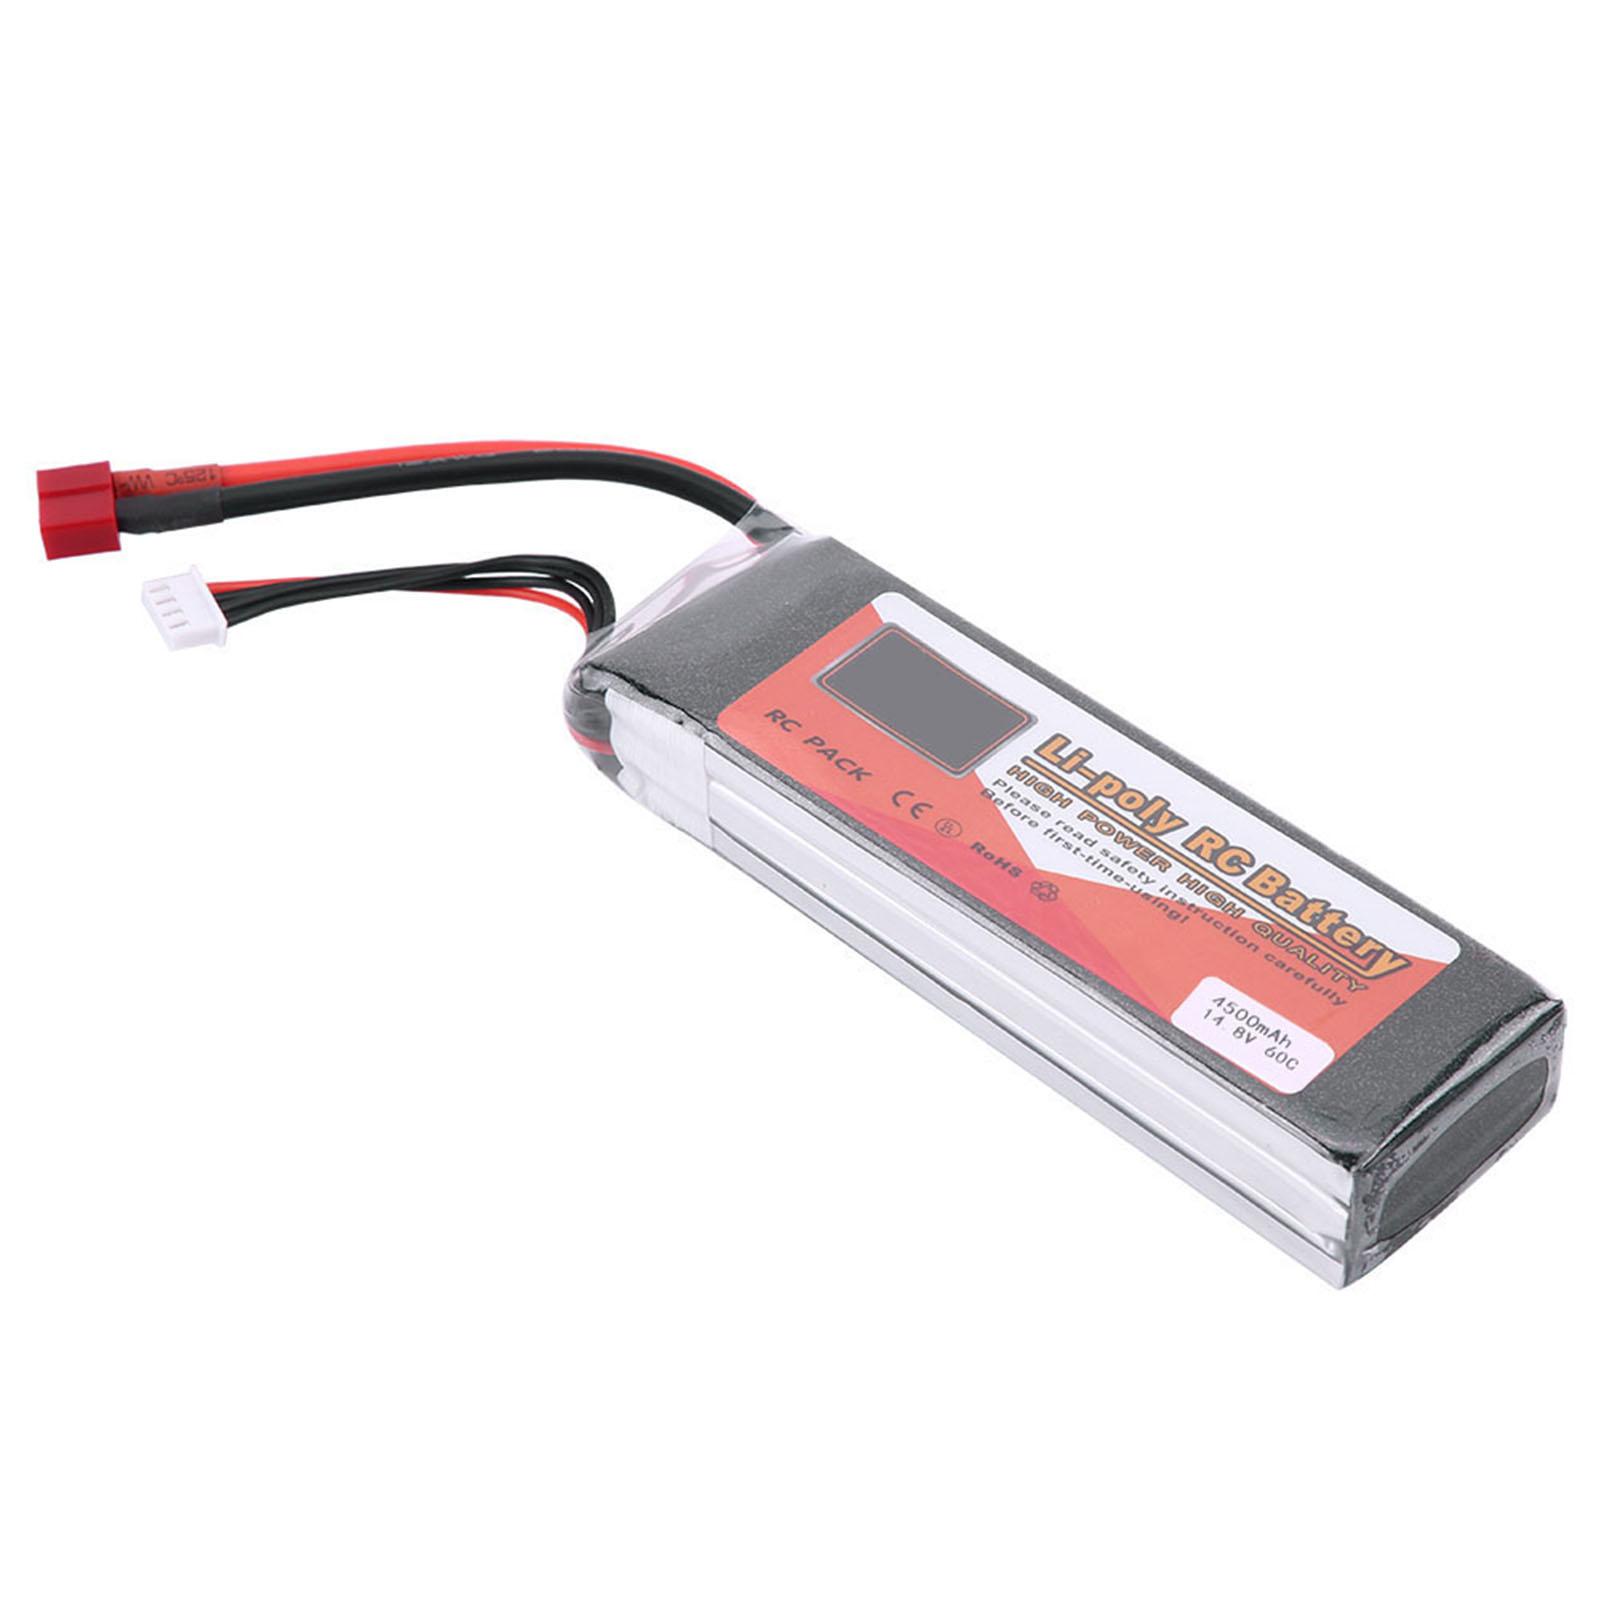 ZOP POWER 4S 14.8V 3500mAh 4500mAh 5500mAh 60C 60C 60C Rechargeable LiPo Battery T Plug d7134a